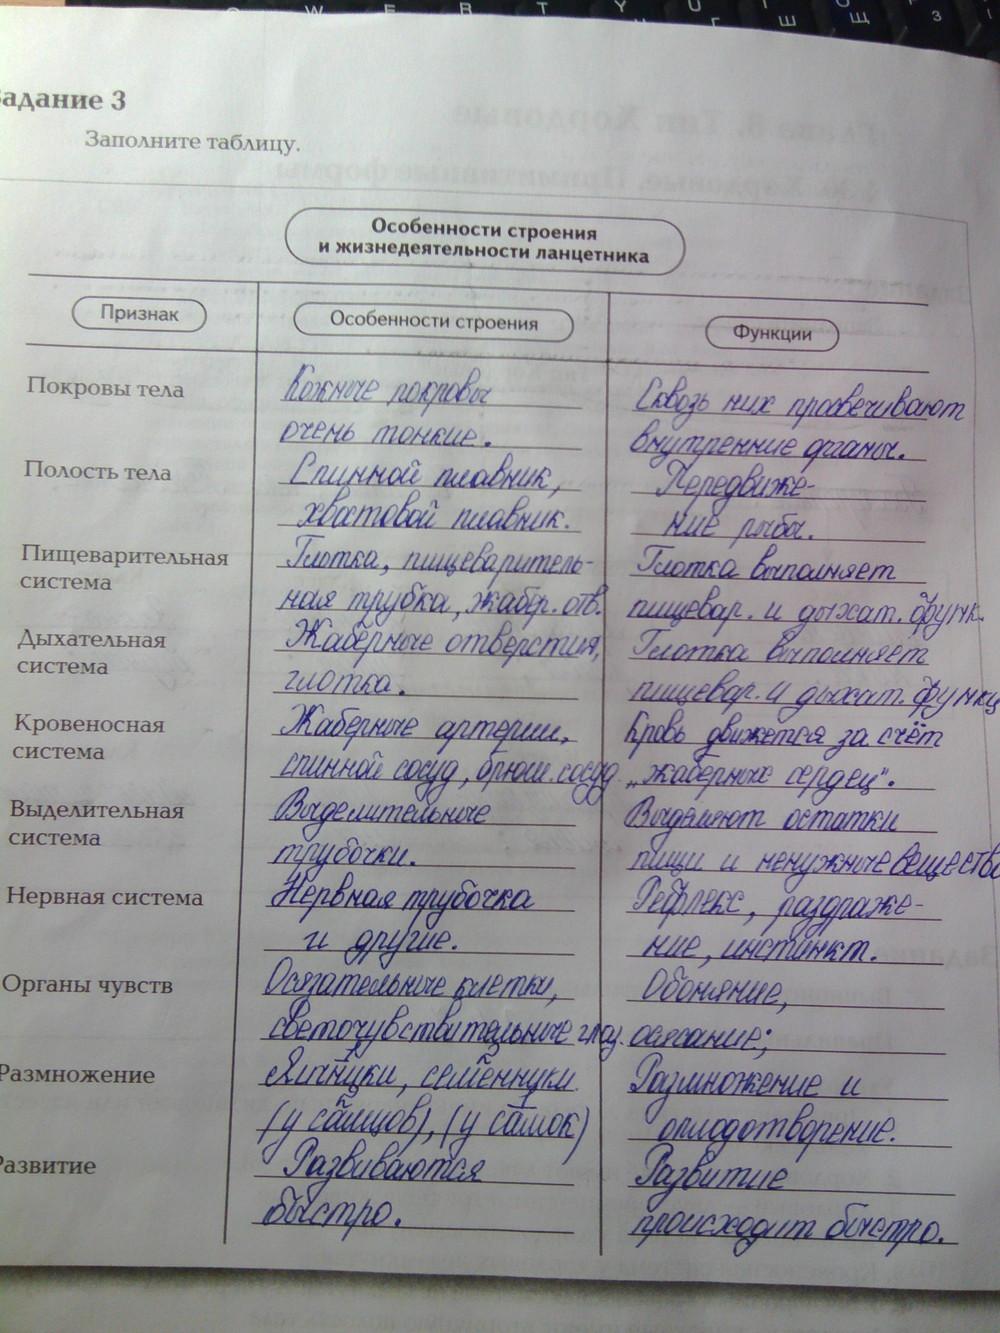 По рабочая суматохин москва биологии тетрадь 7 класс 2017 гдз